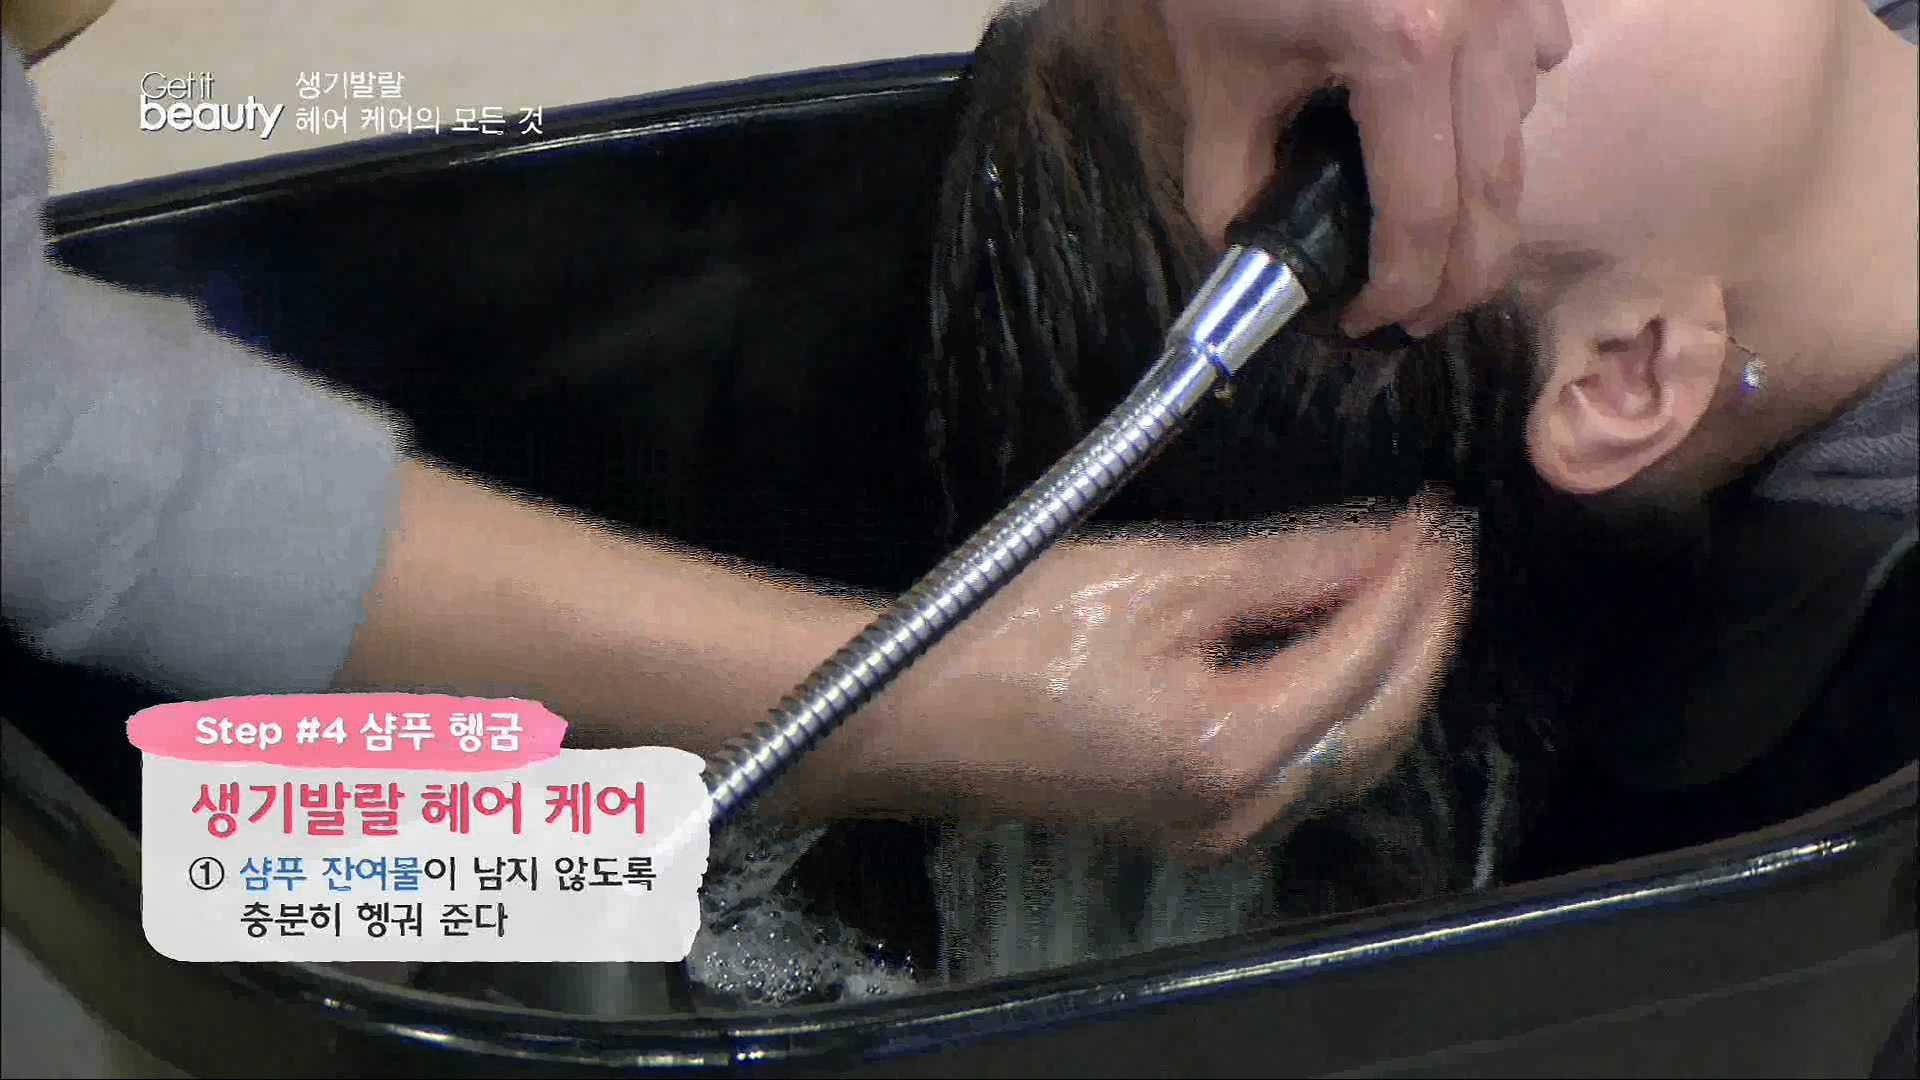 Step#4.샴푸 헹굼 1.샴푸 잔여물이 남지 않도록 충분히 헹궈준다. 따뜻한 물로 충분히 불려준 후 시원한 물로 마무리 해준다.